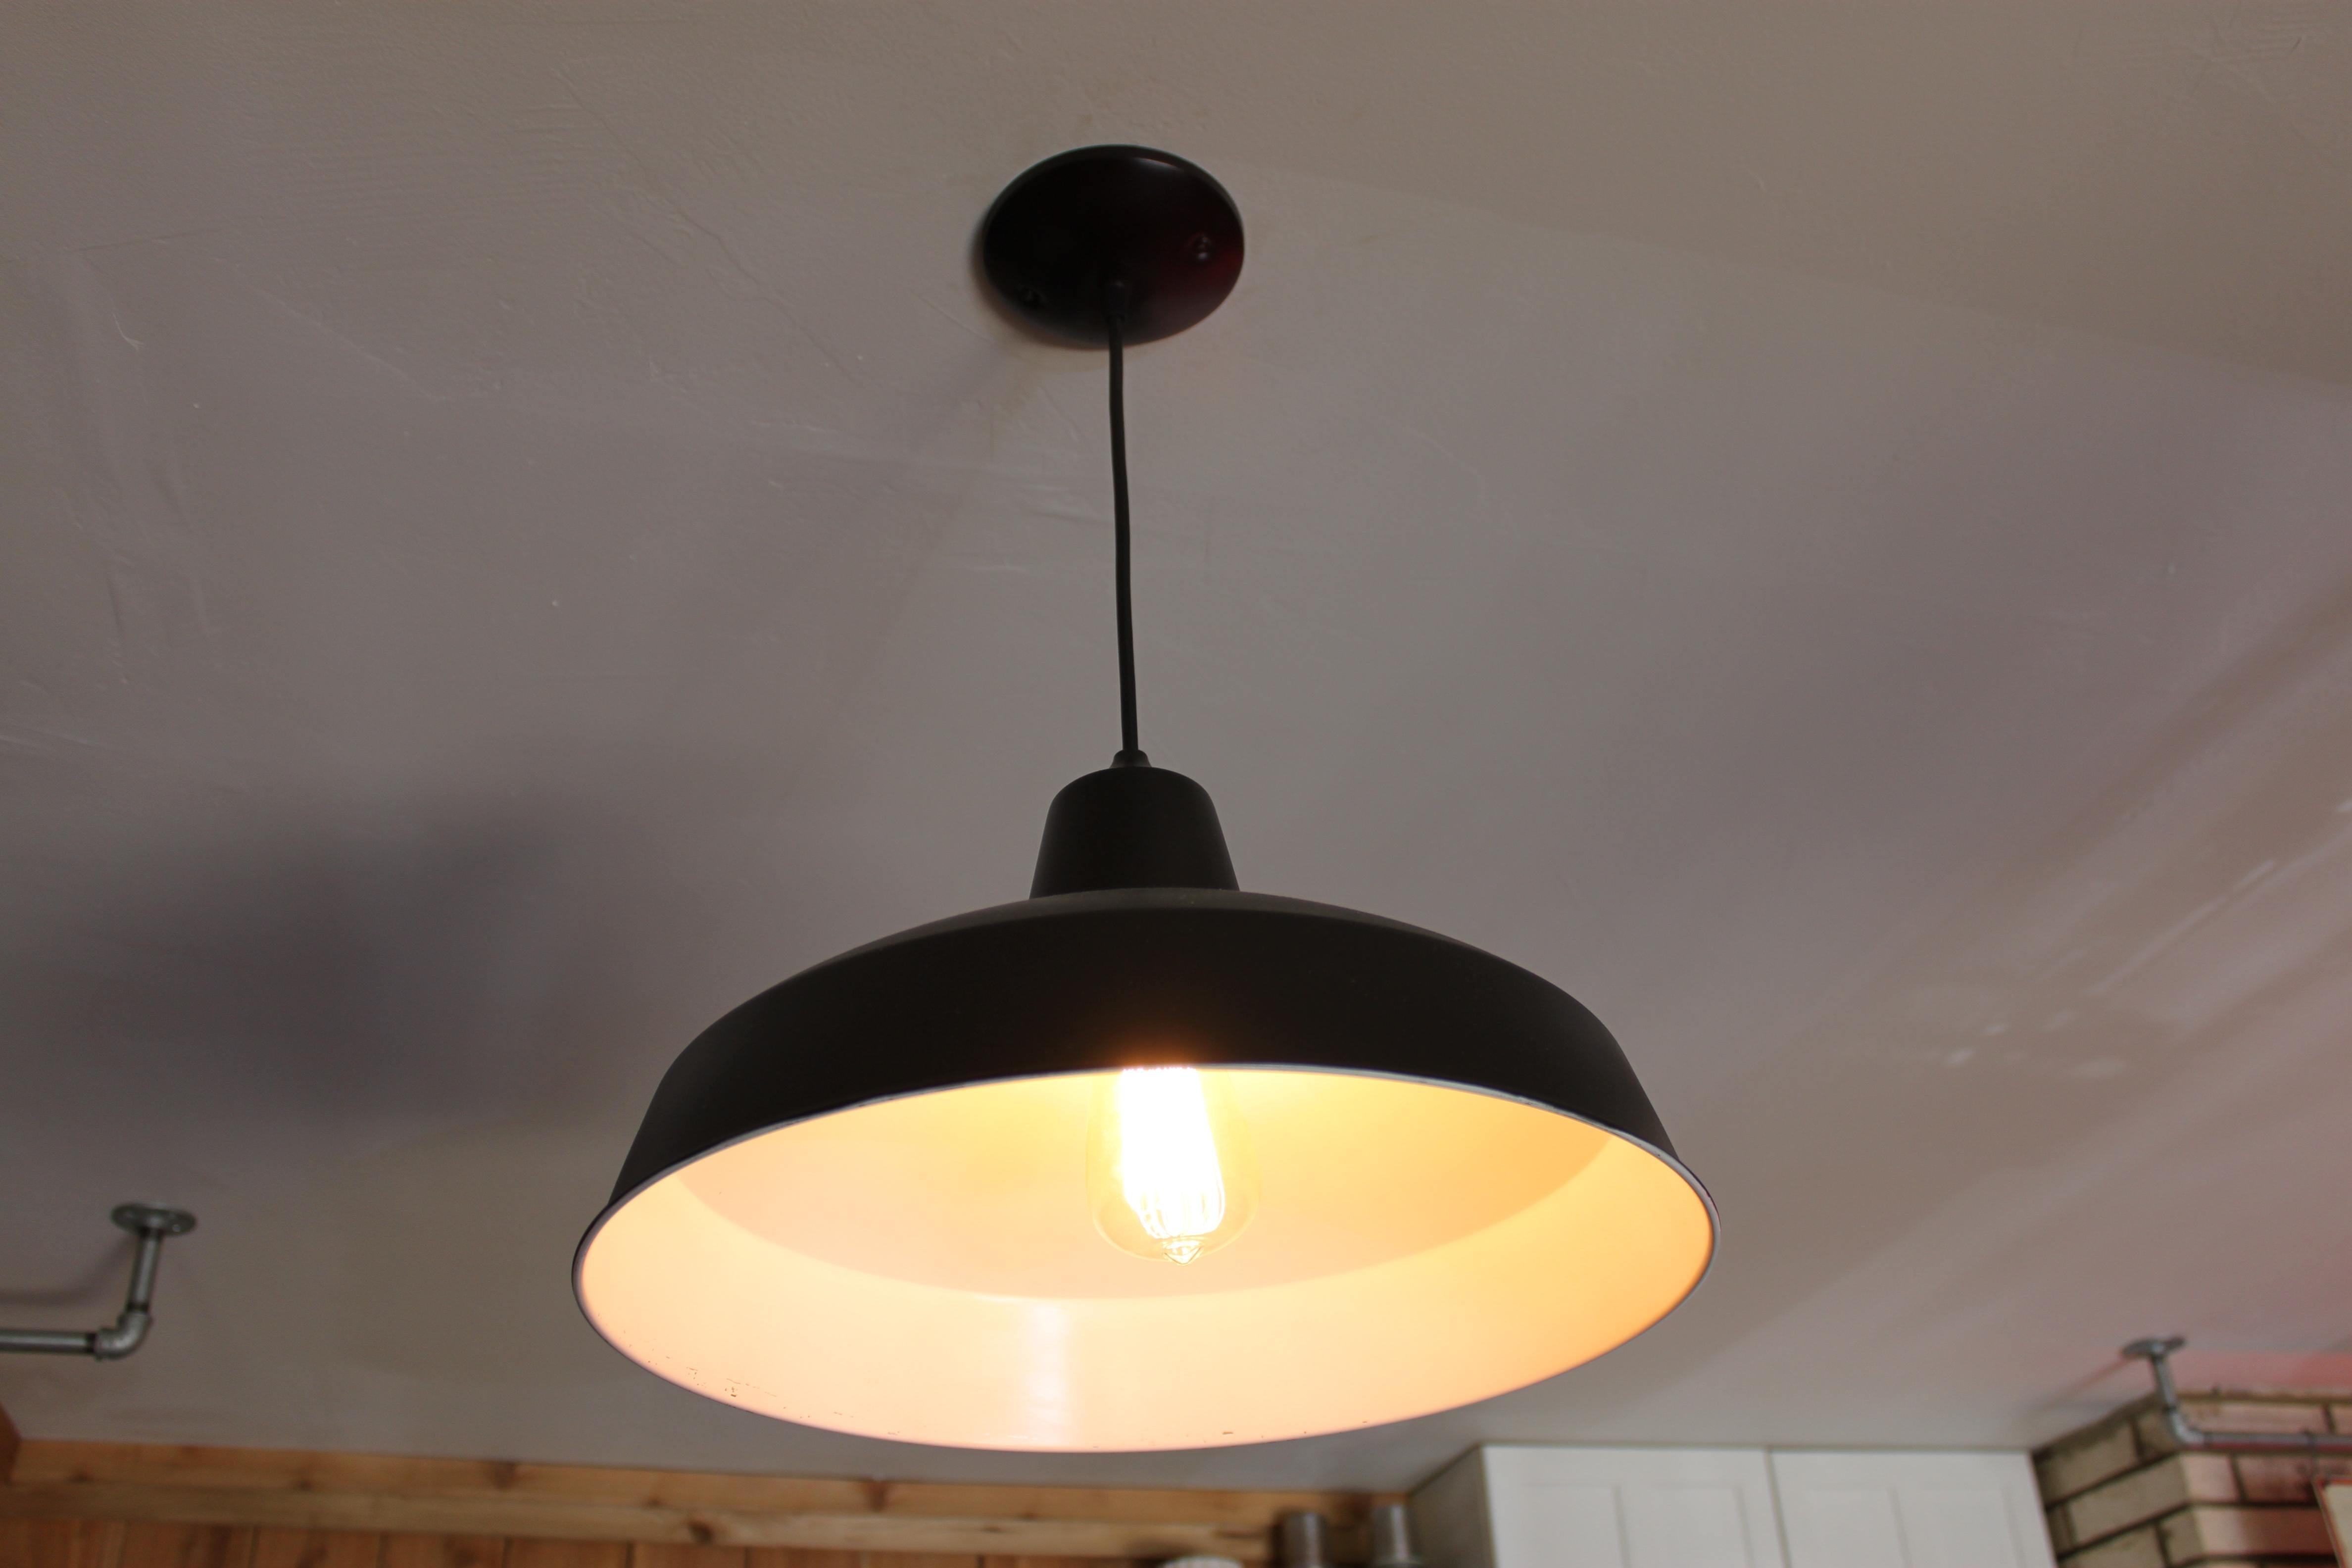 Lamp: Hanging Barn Lights The Cavender Diary Barn Pendant Light Barn Regarding Outdoor Hanging Barn Lights (View 10 of 15)